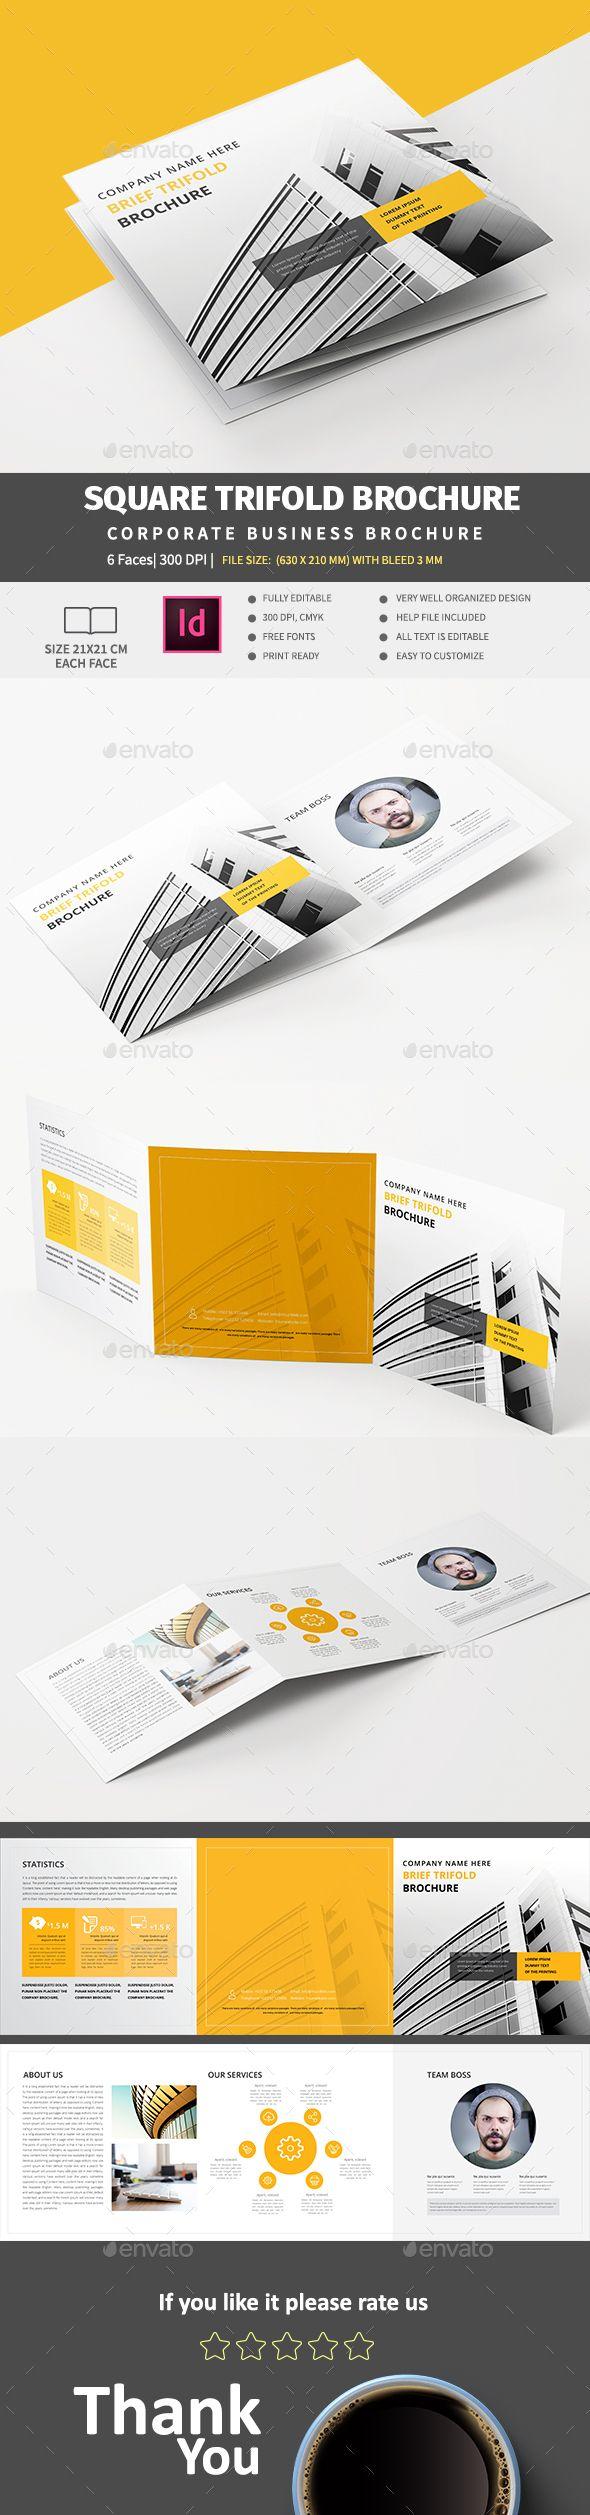 Square Tri-Fold Brochure Template InDesign INDD